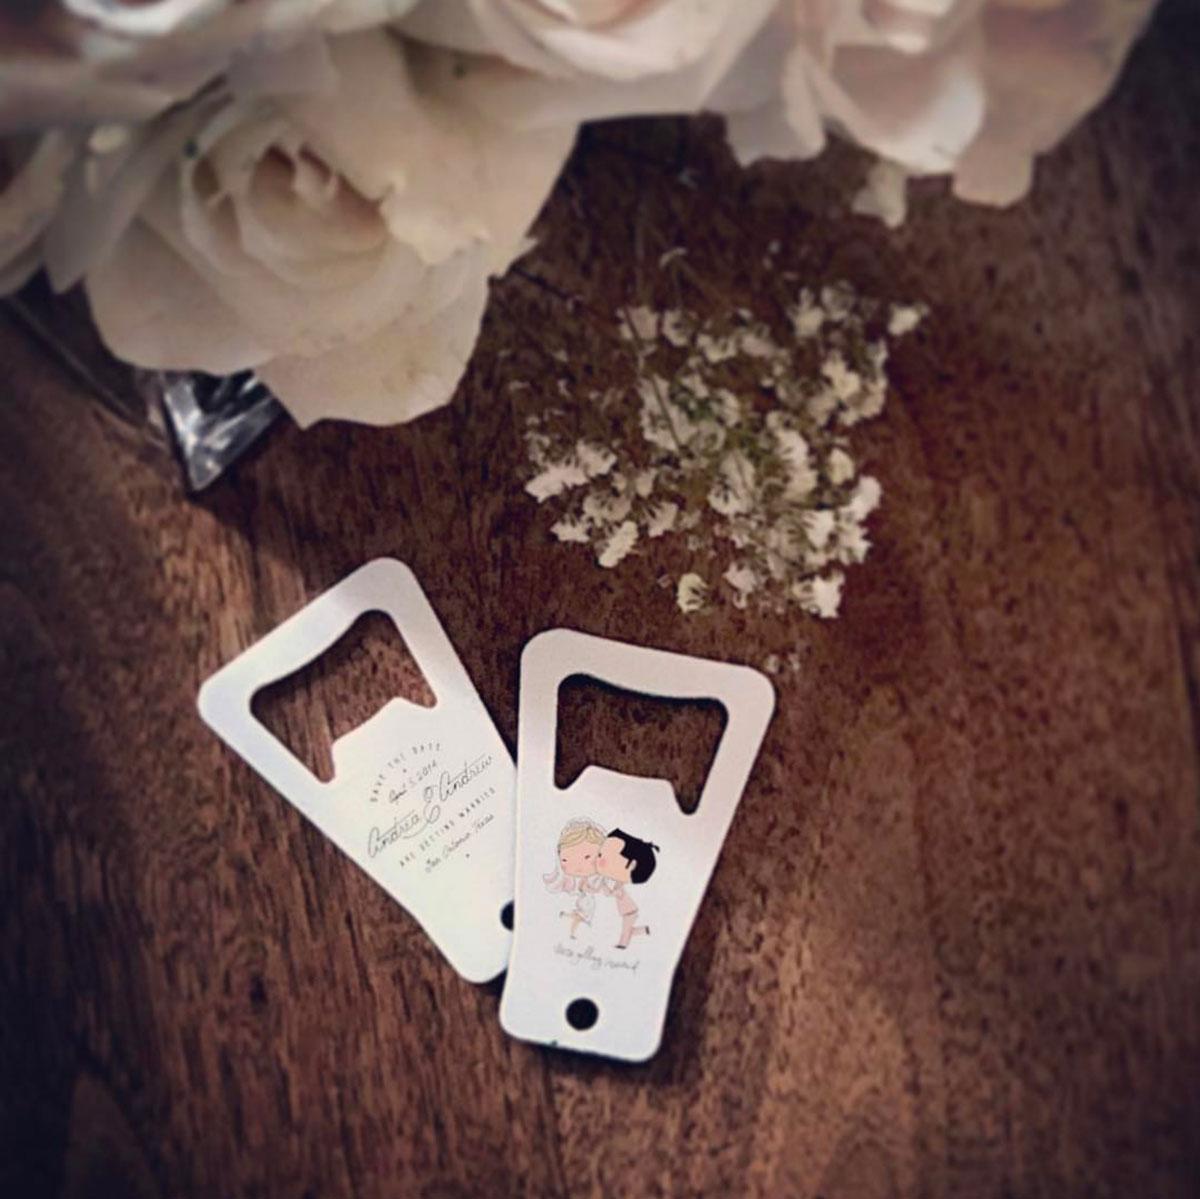 cadeau de mariage original original wedding gift. Black Bedroom Furniture Sets. Home Design Ideas